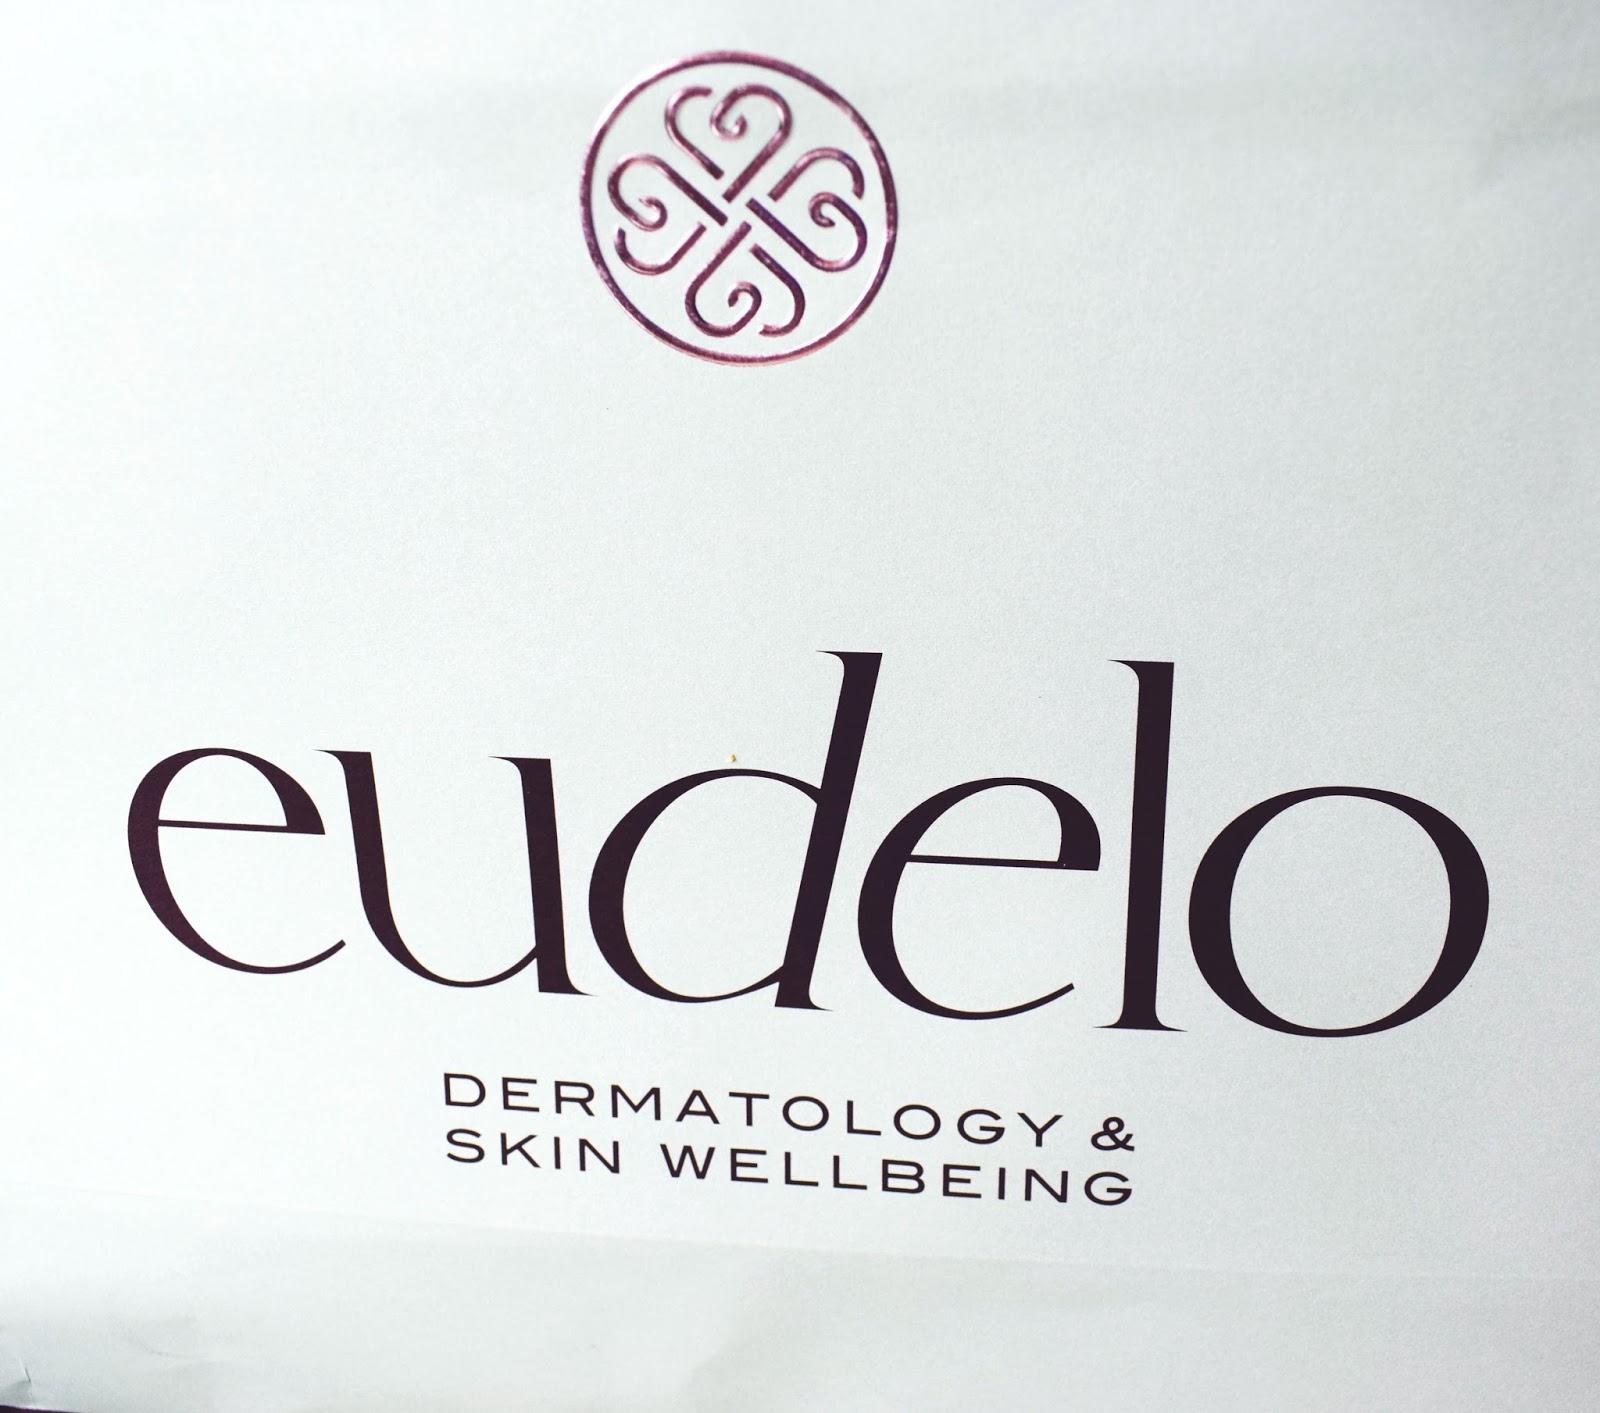 lebellelavie - #Acne101 with Eudelo & Dr. Stefanie Williams